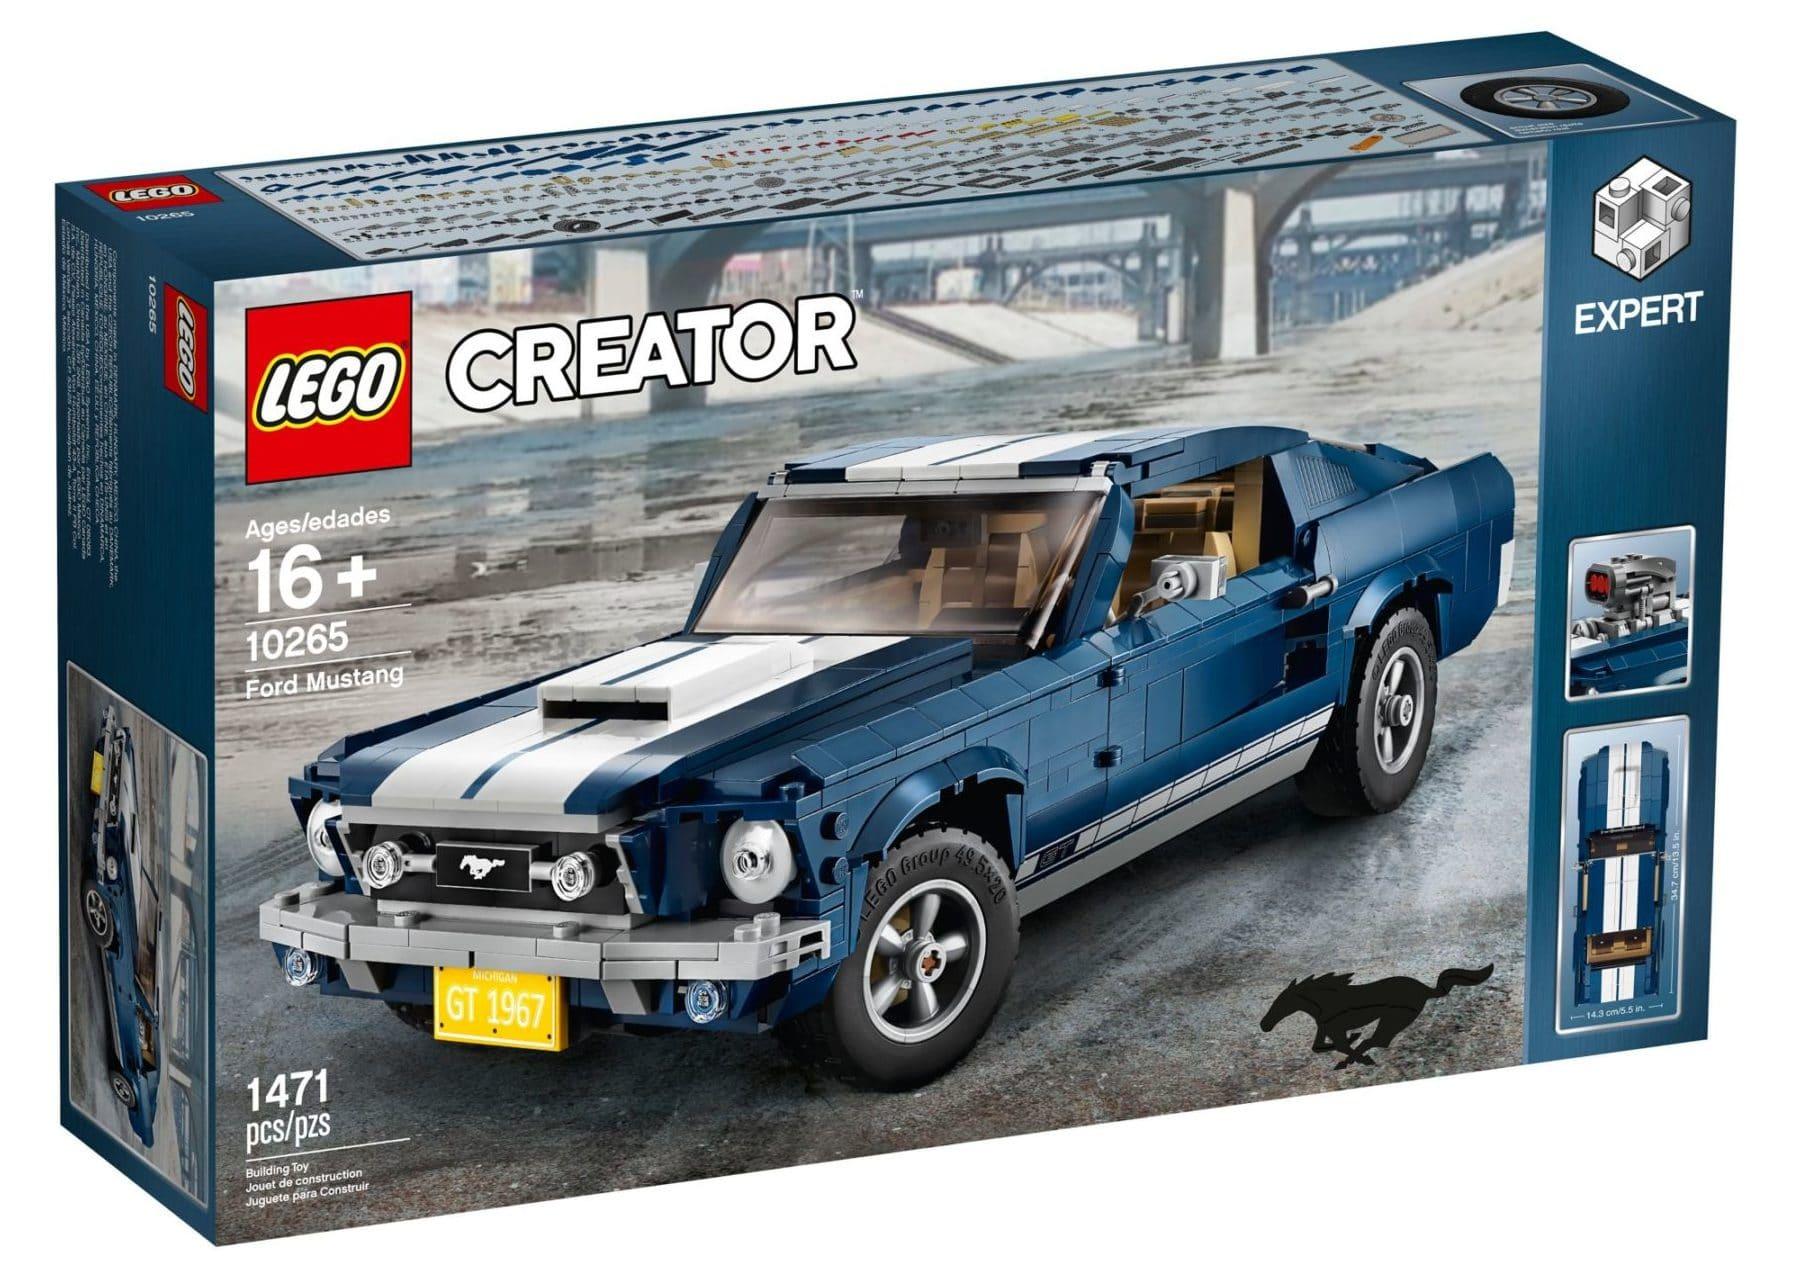 Lego 10265 Ford Mustang Lieferbar Ab Wann Mit Rabatt Verfügbar